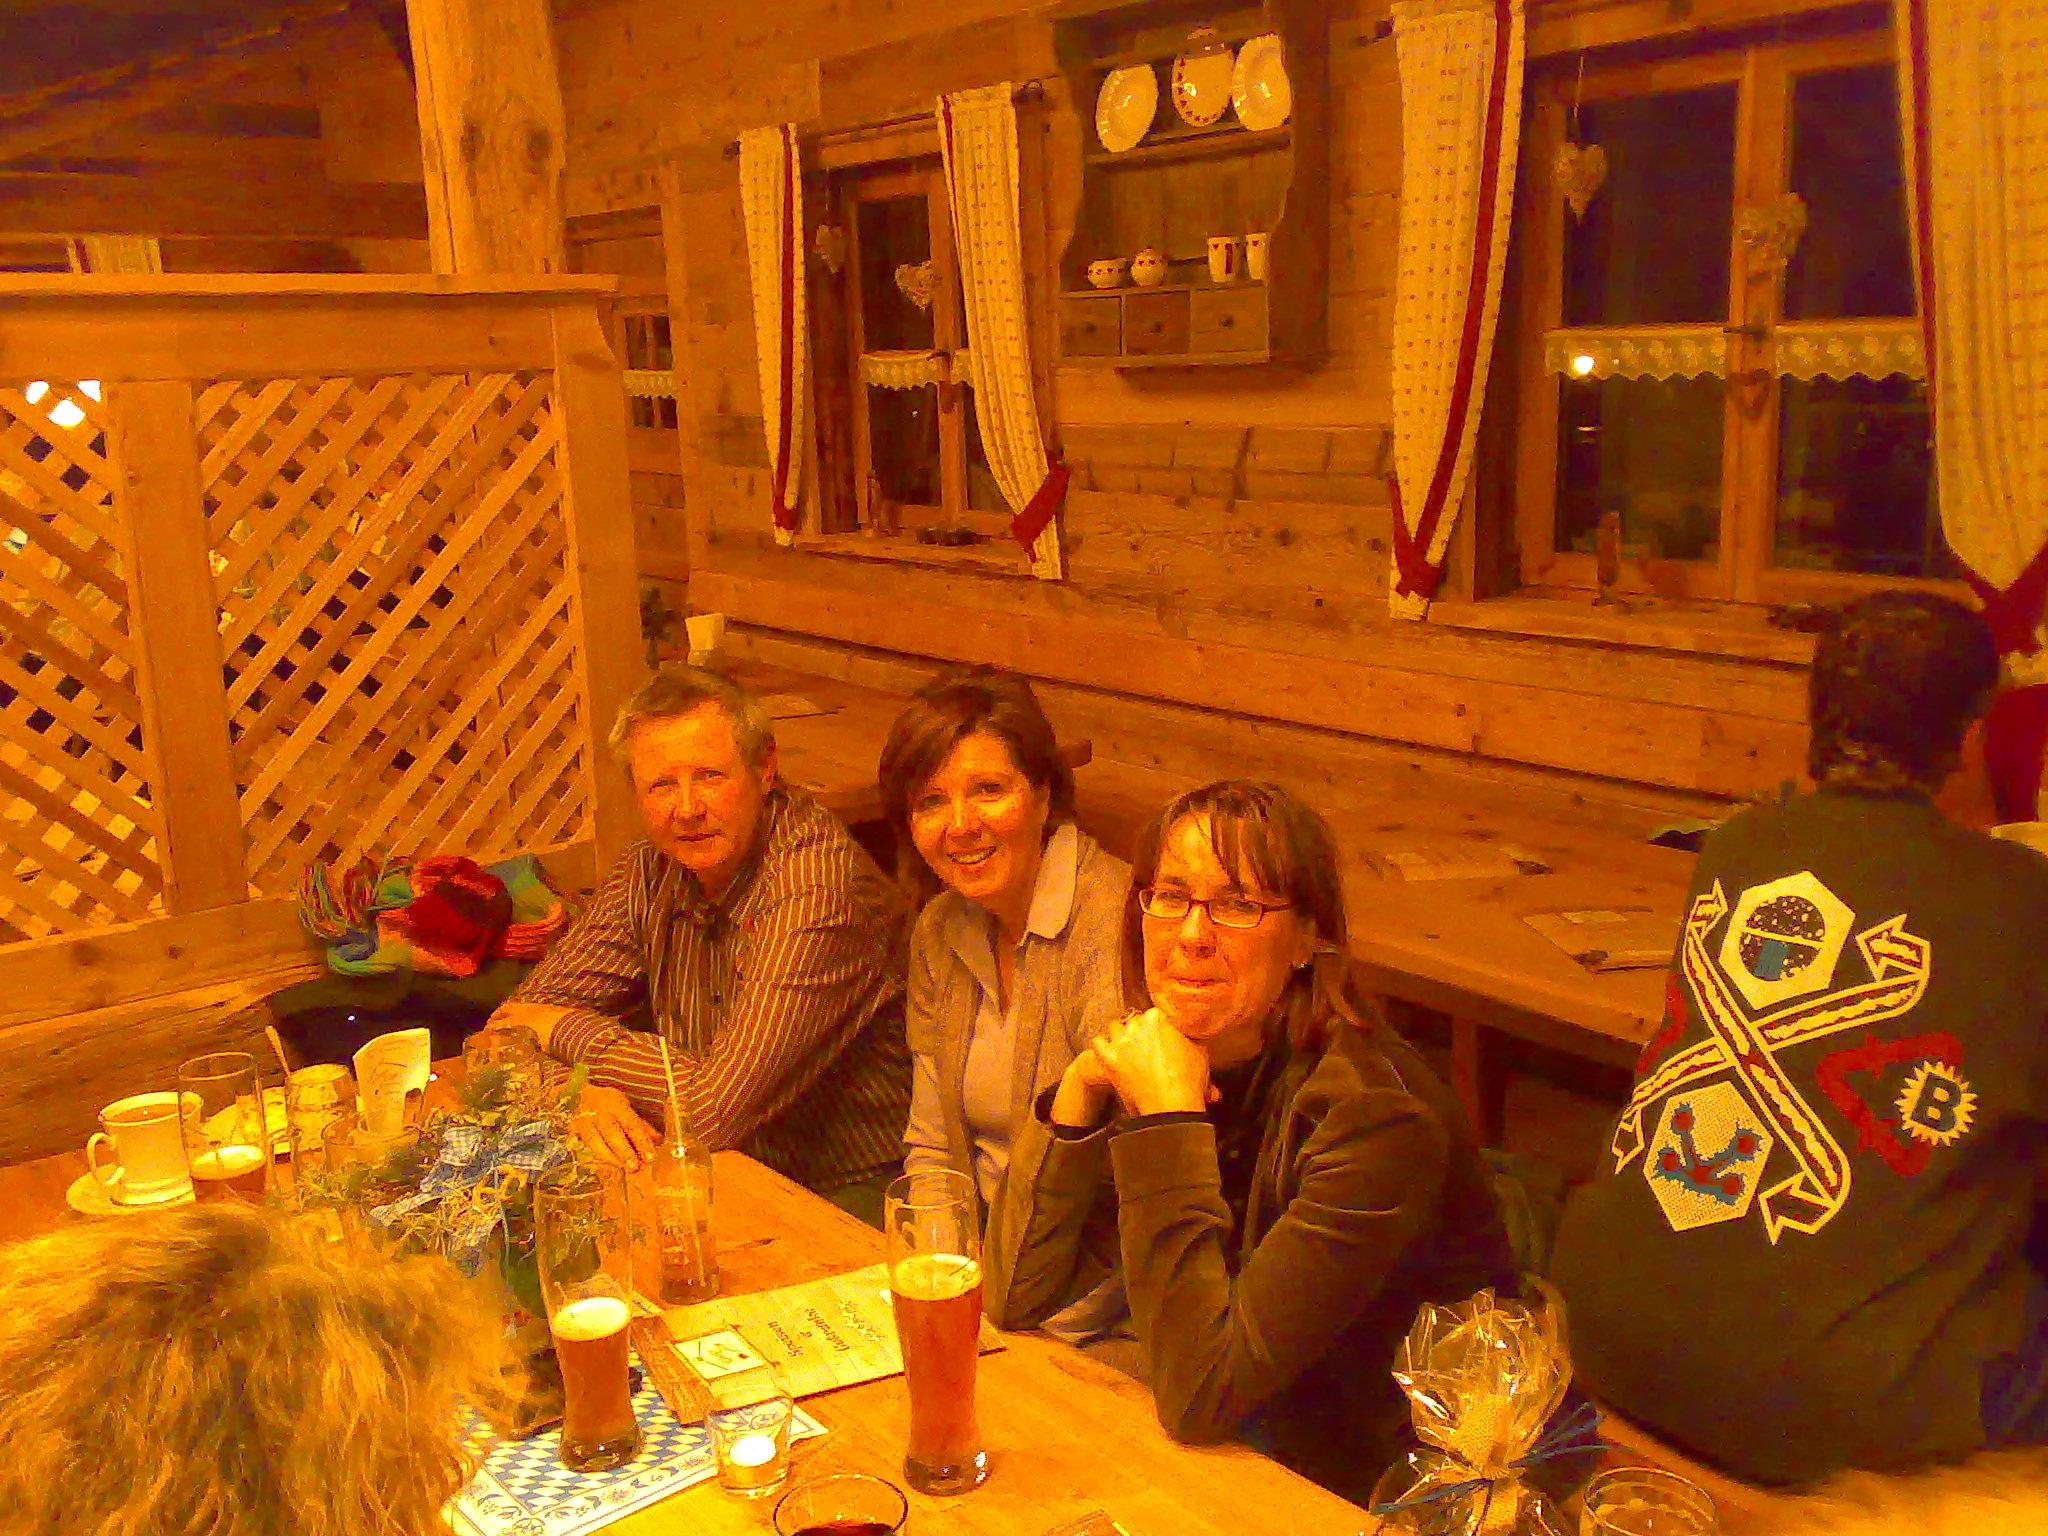 Uwe, Bärbel, Anja